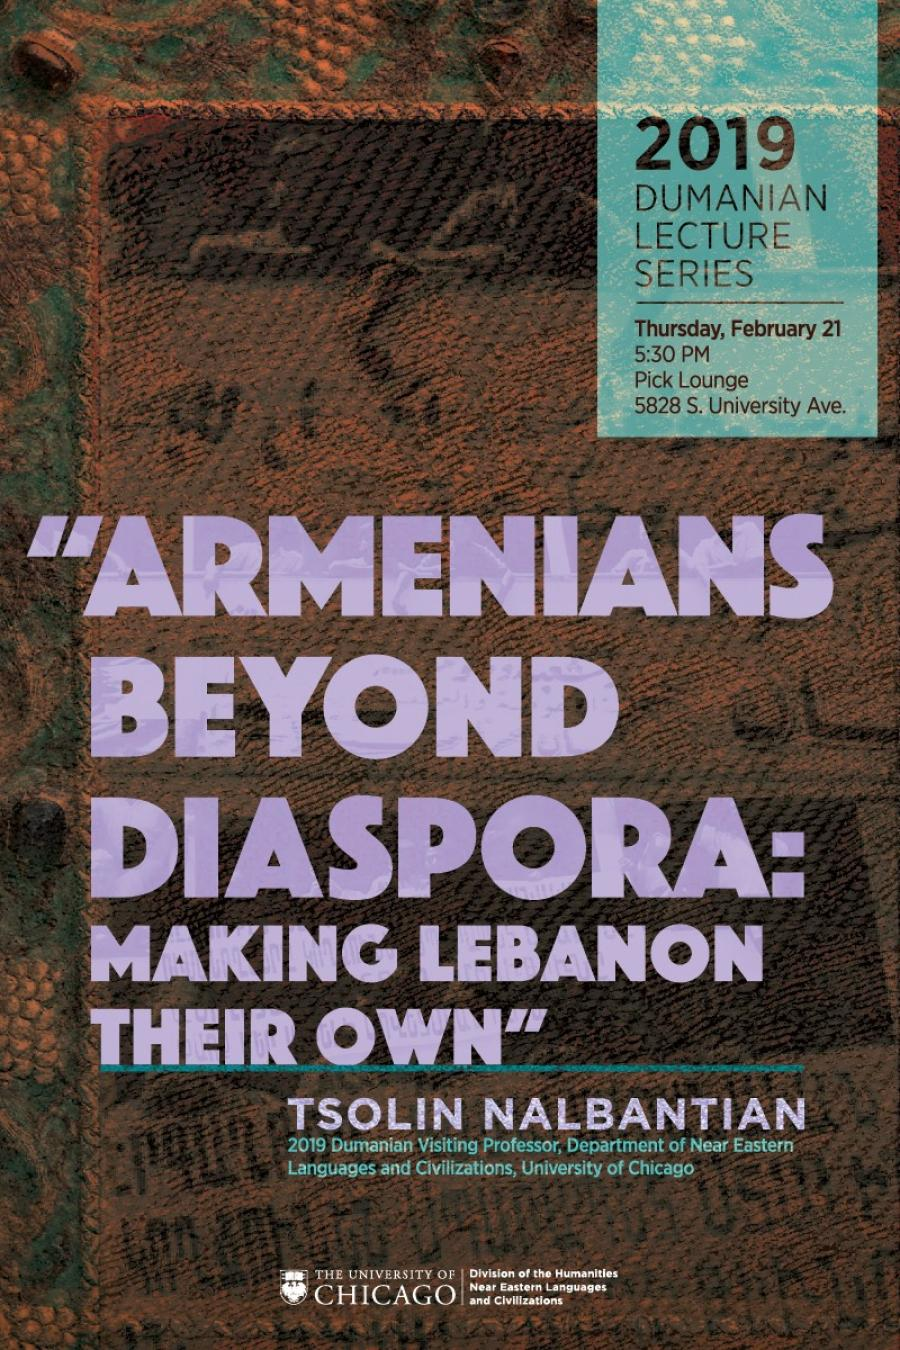 2019 Dumanian Lecture with Tsolin Nalbantian